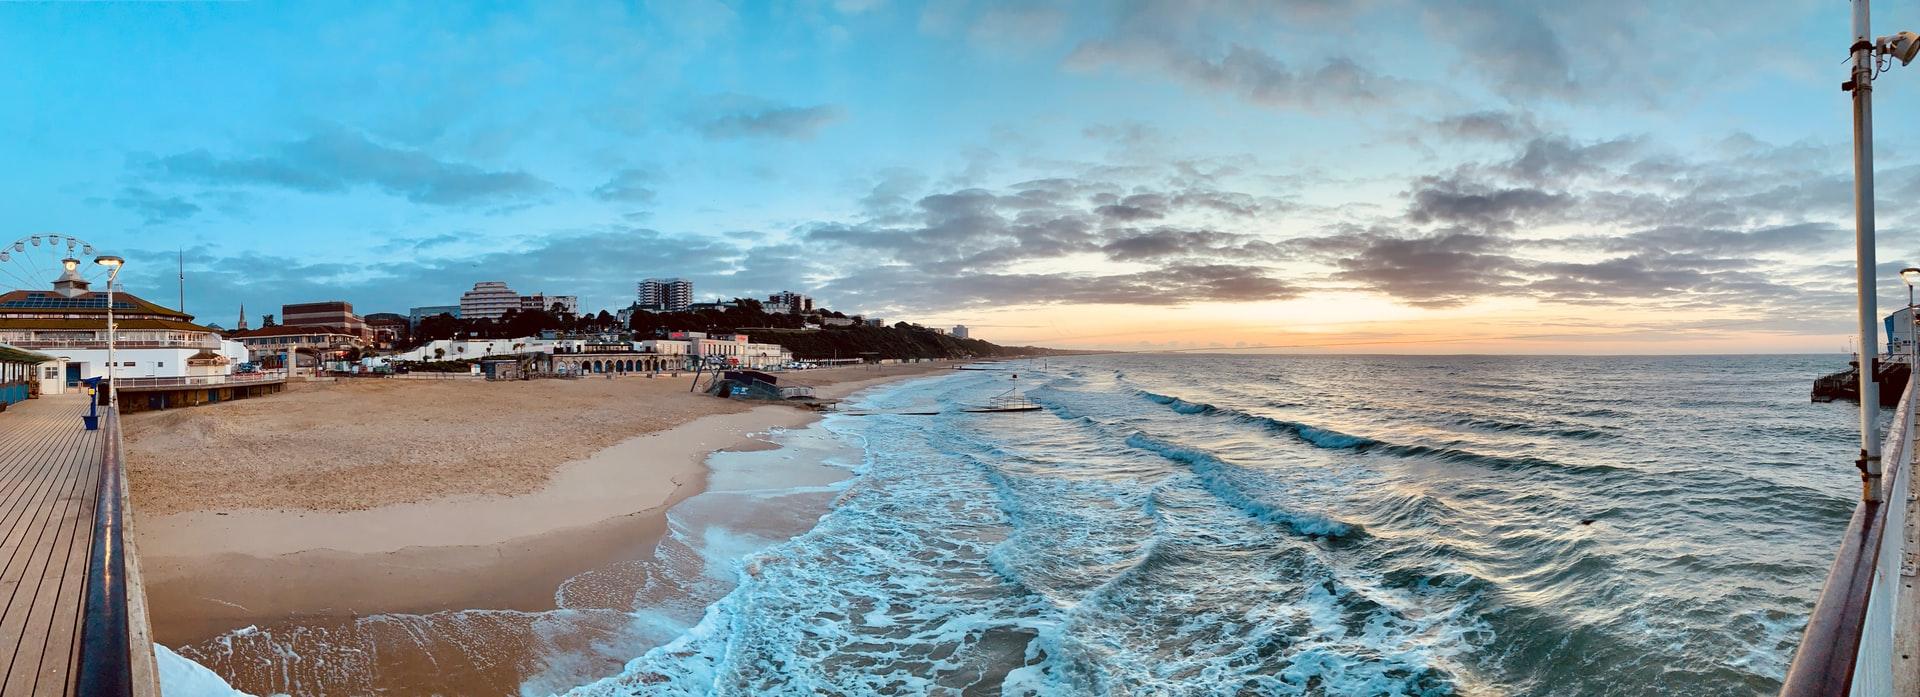 Bournemouth Beach - Edwards Estate Agents